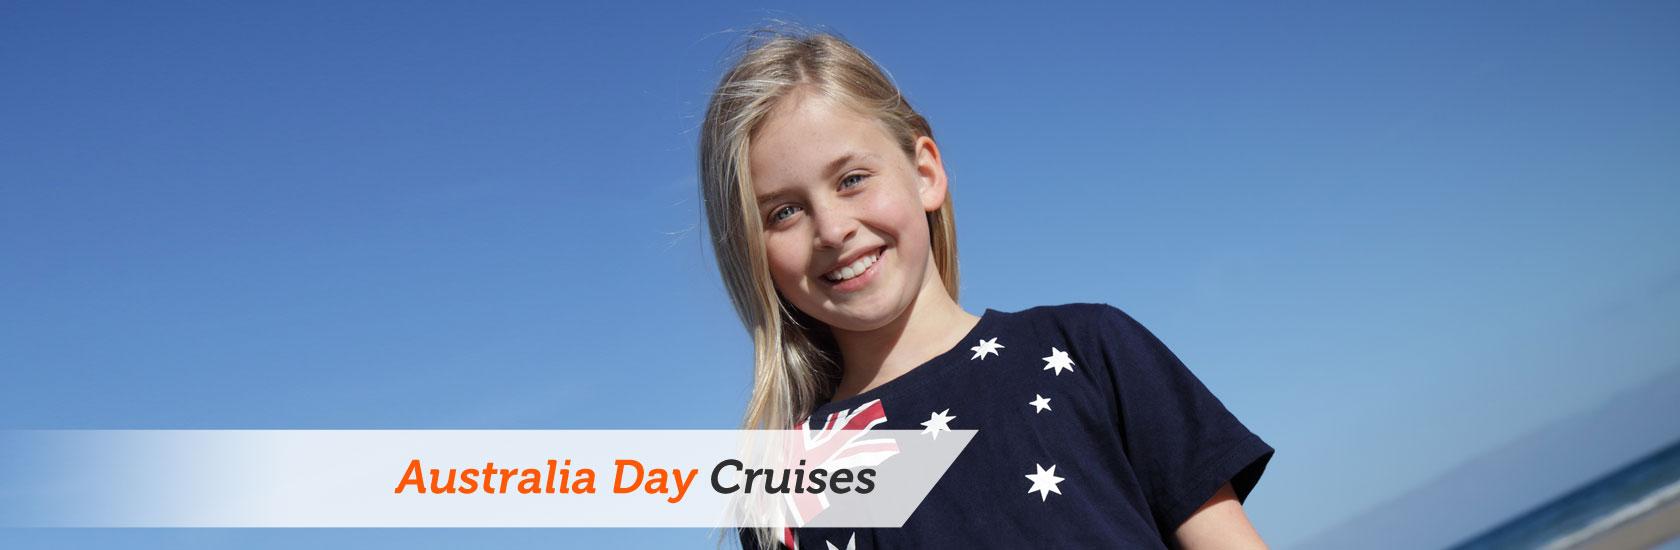 banner_australiaday